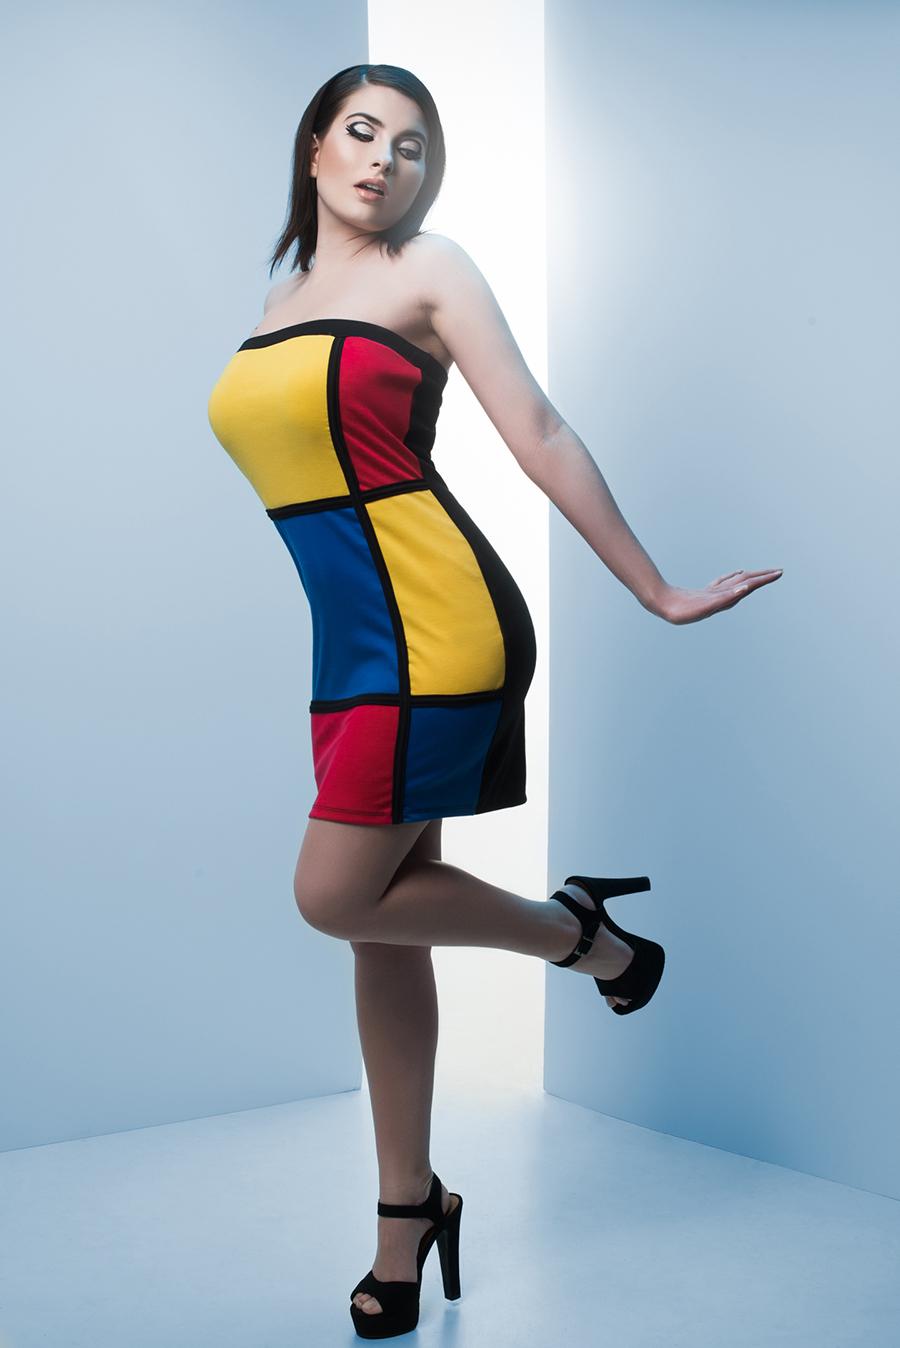 Mondrian-0541-2-web.jpg